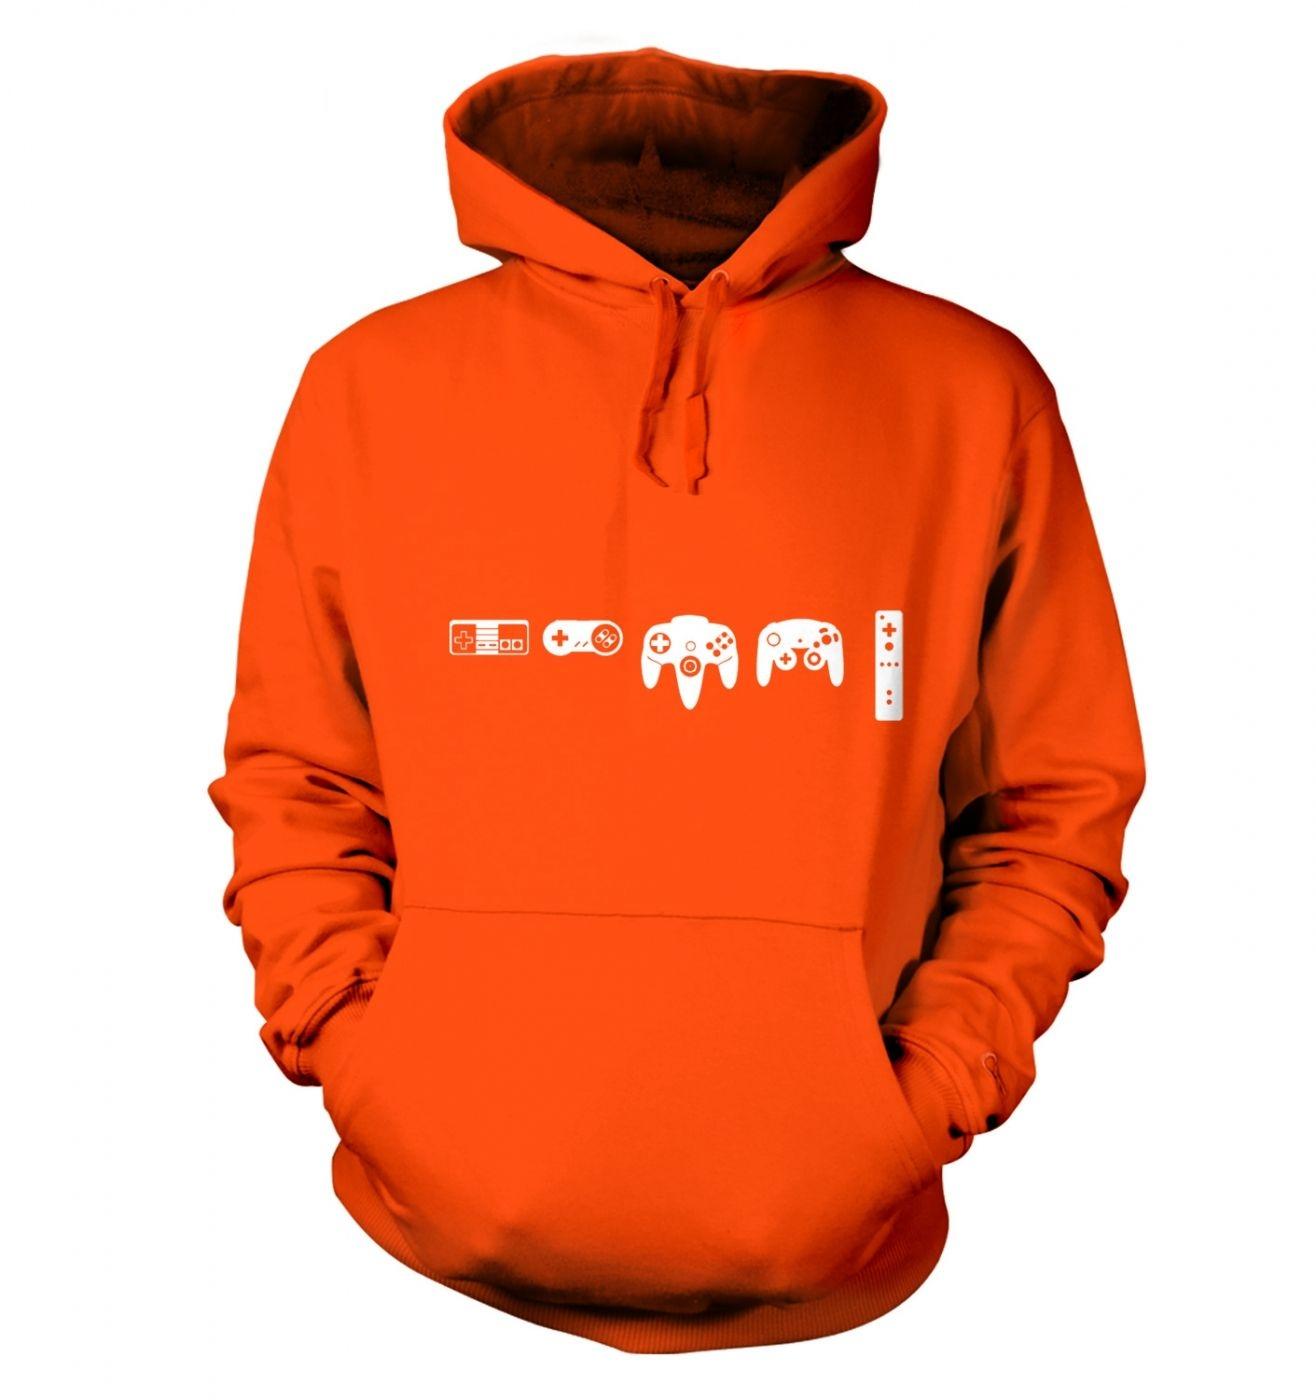 Evolution Of Nintendo hoodie